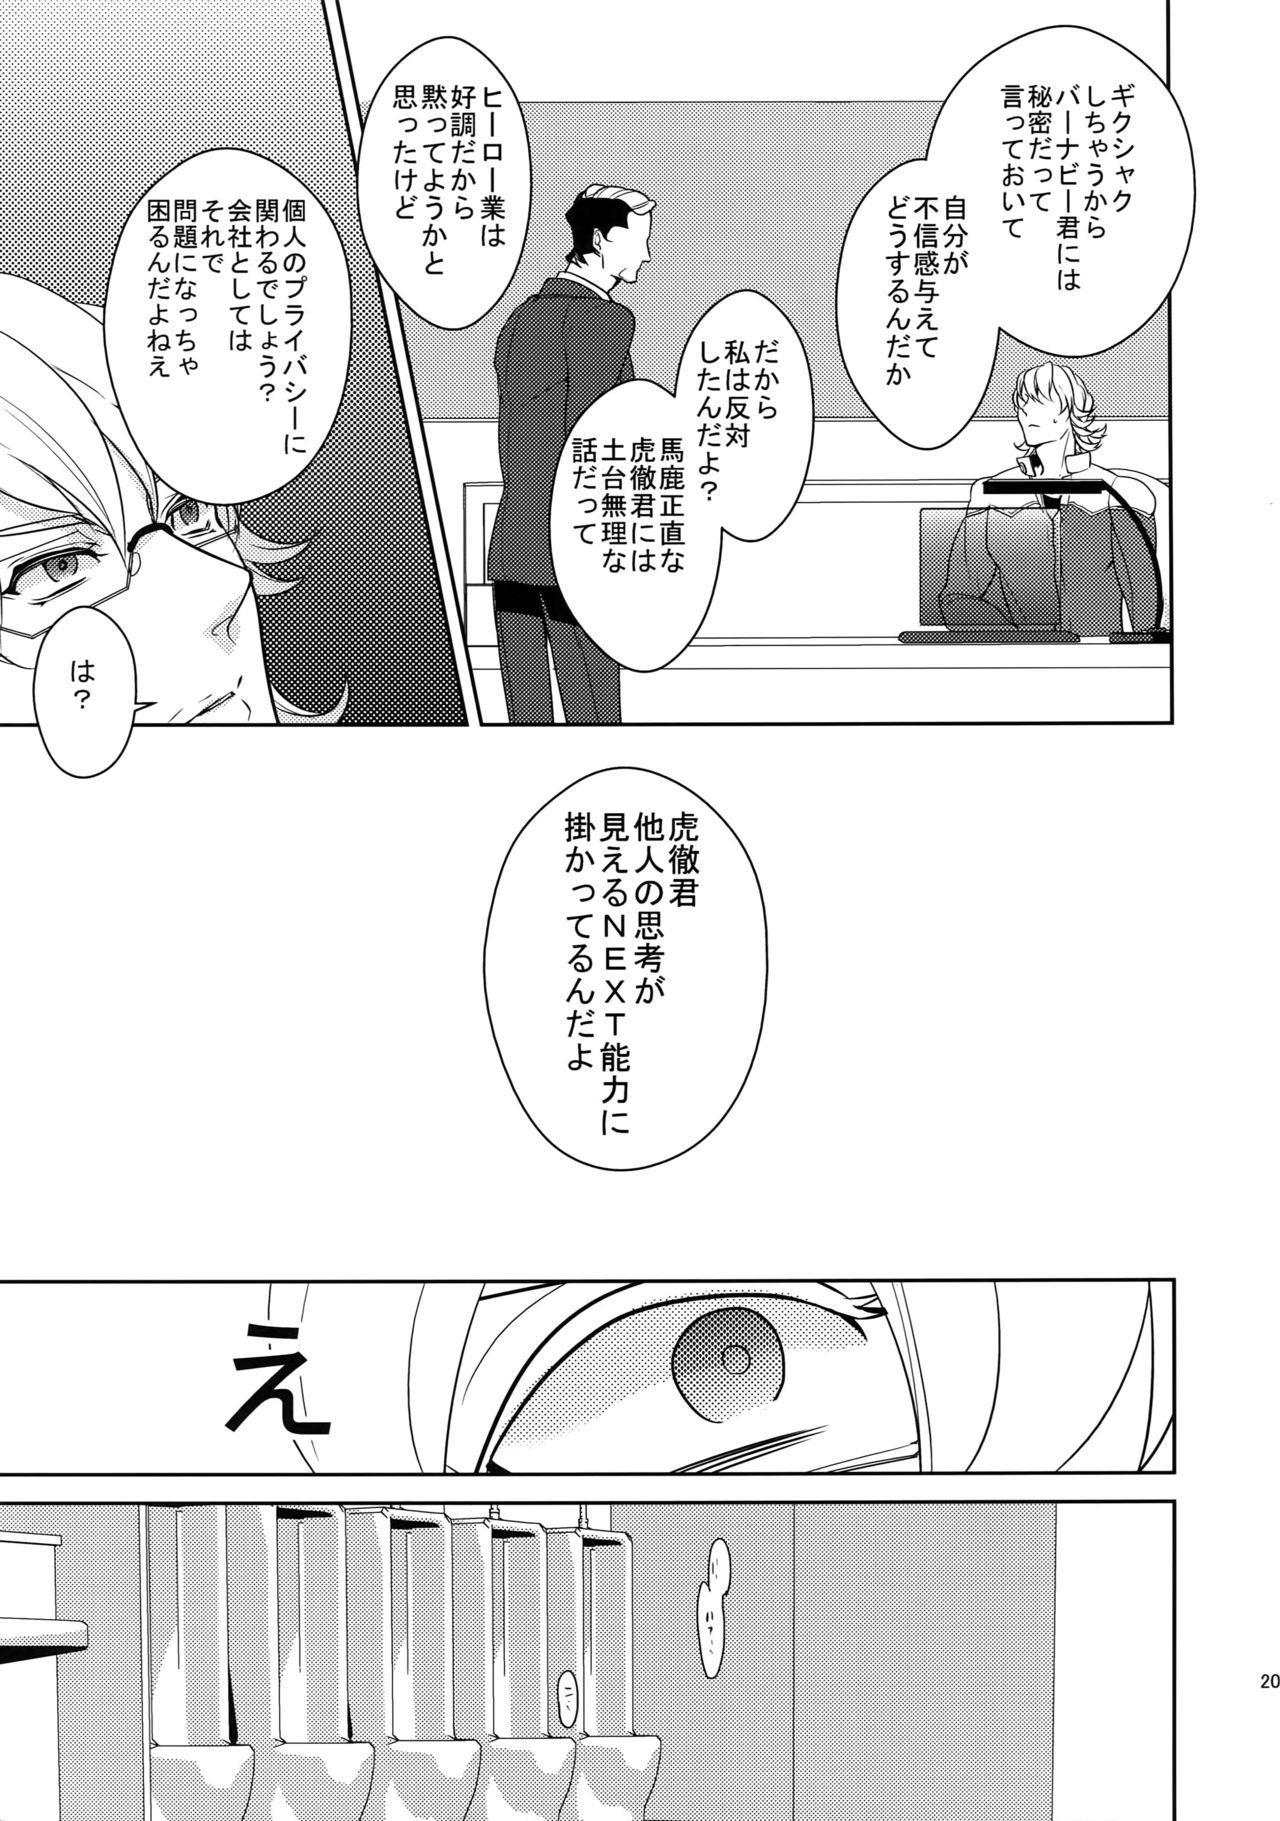 BOROZS Usagi Tora Sairoku 2 199